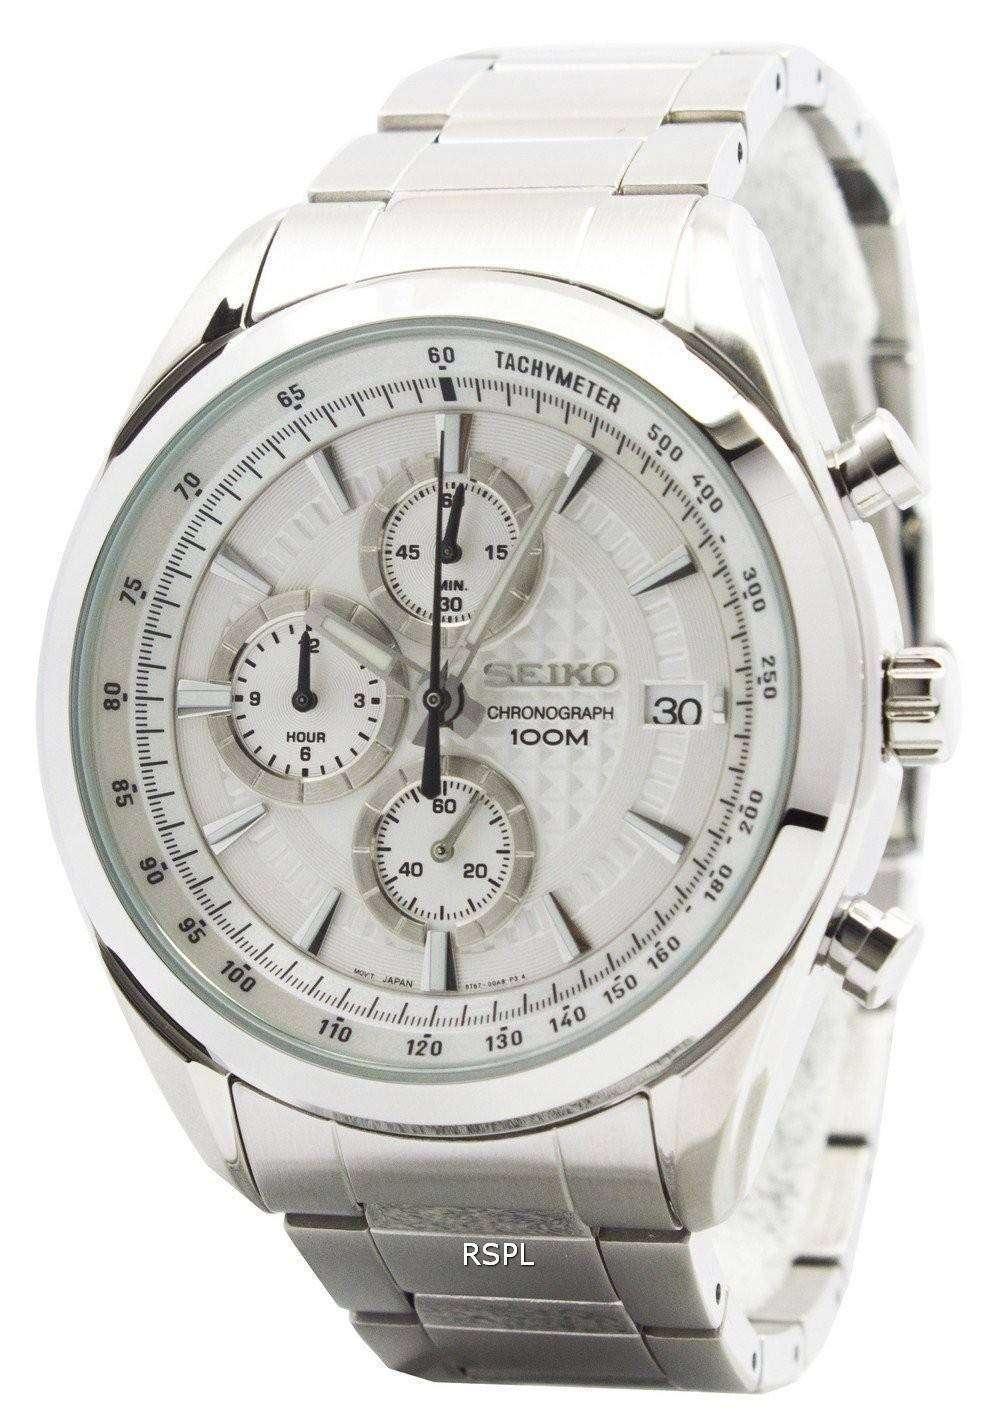 Seiko Chronograph Jam Tangan Tali Stainless Steel Silver Ssb173p1 Strap Sks521p1 Quartz Ssb173p Mens Watch